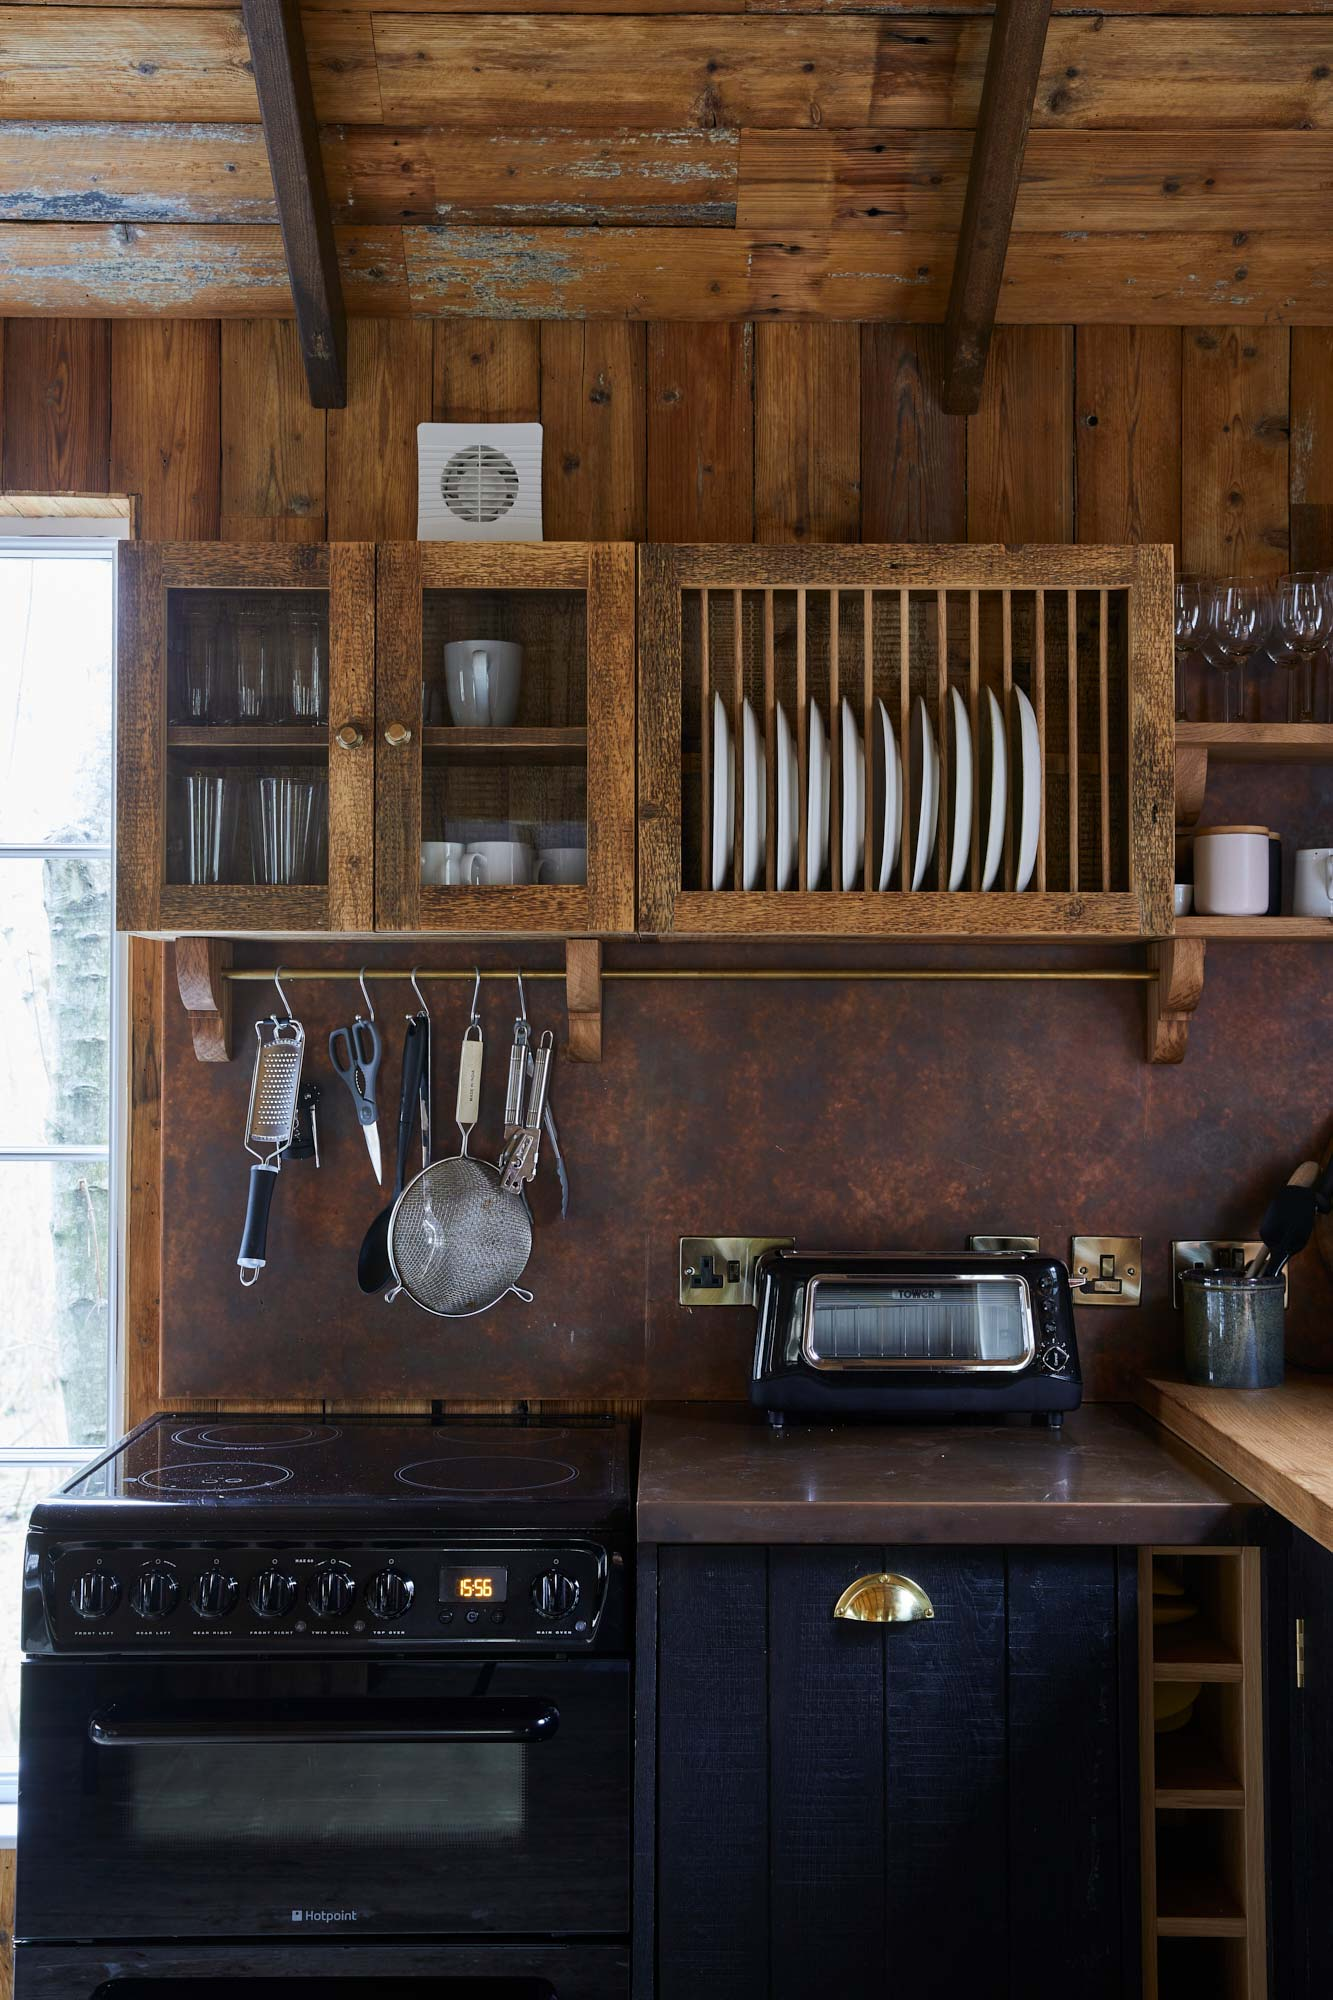 Rustic kitchen plate rack